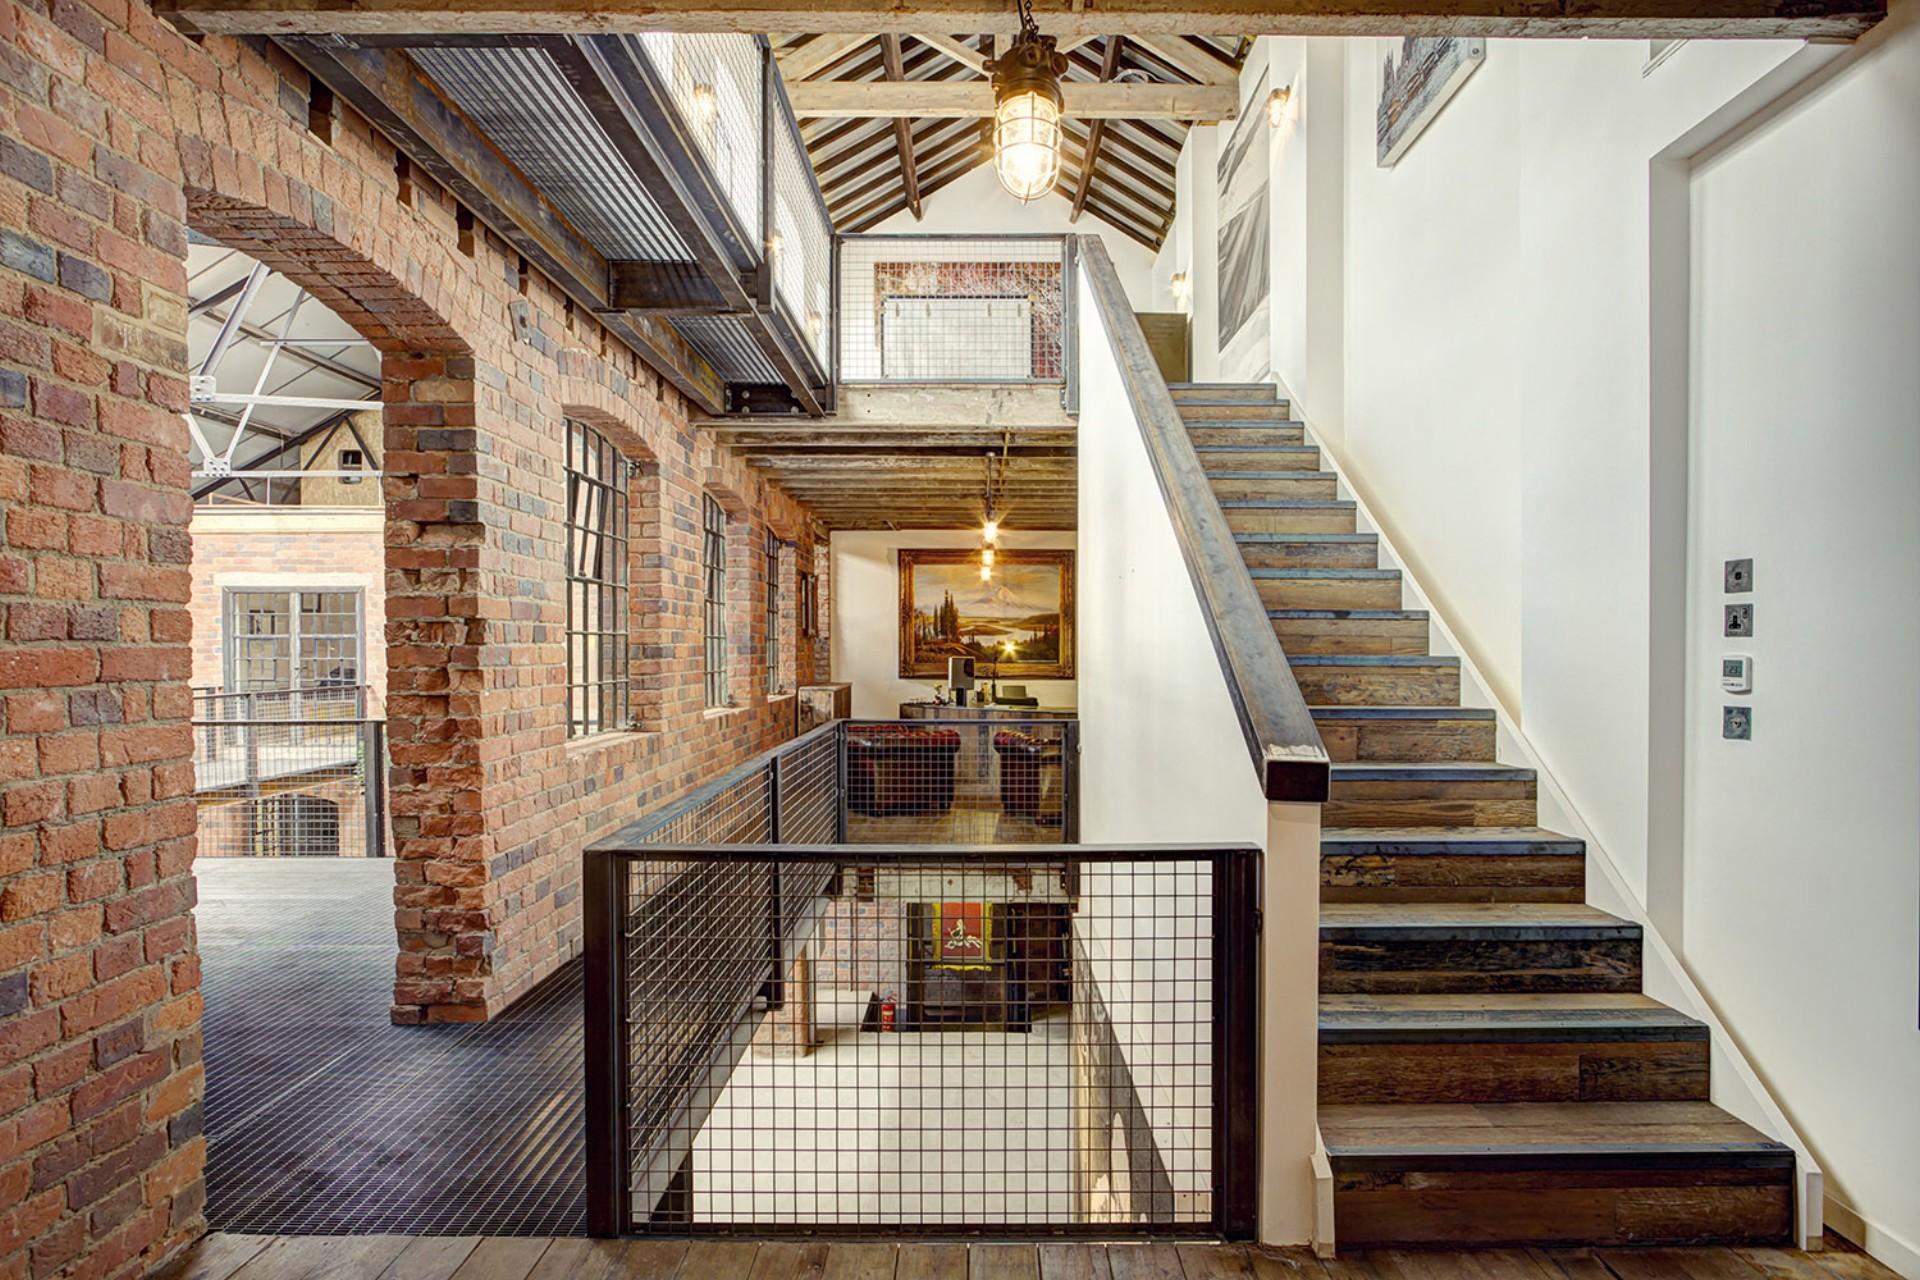 BPN Architects de antigua fábrica a espacio creativo The Compound Birmingham